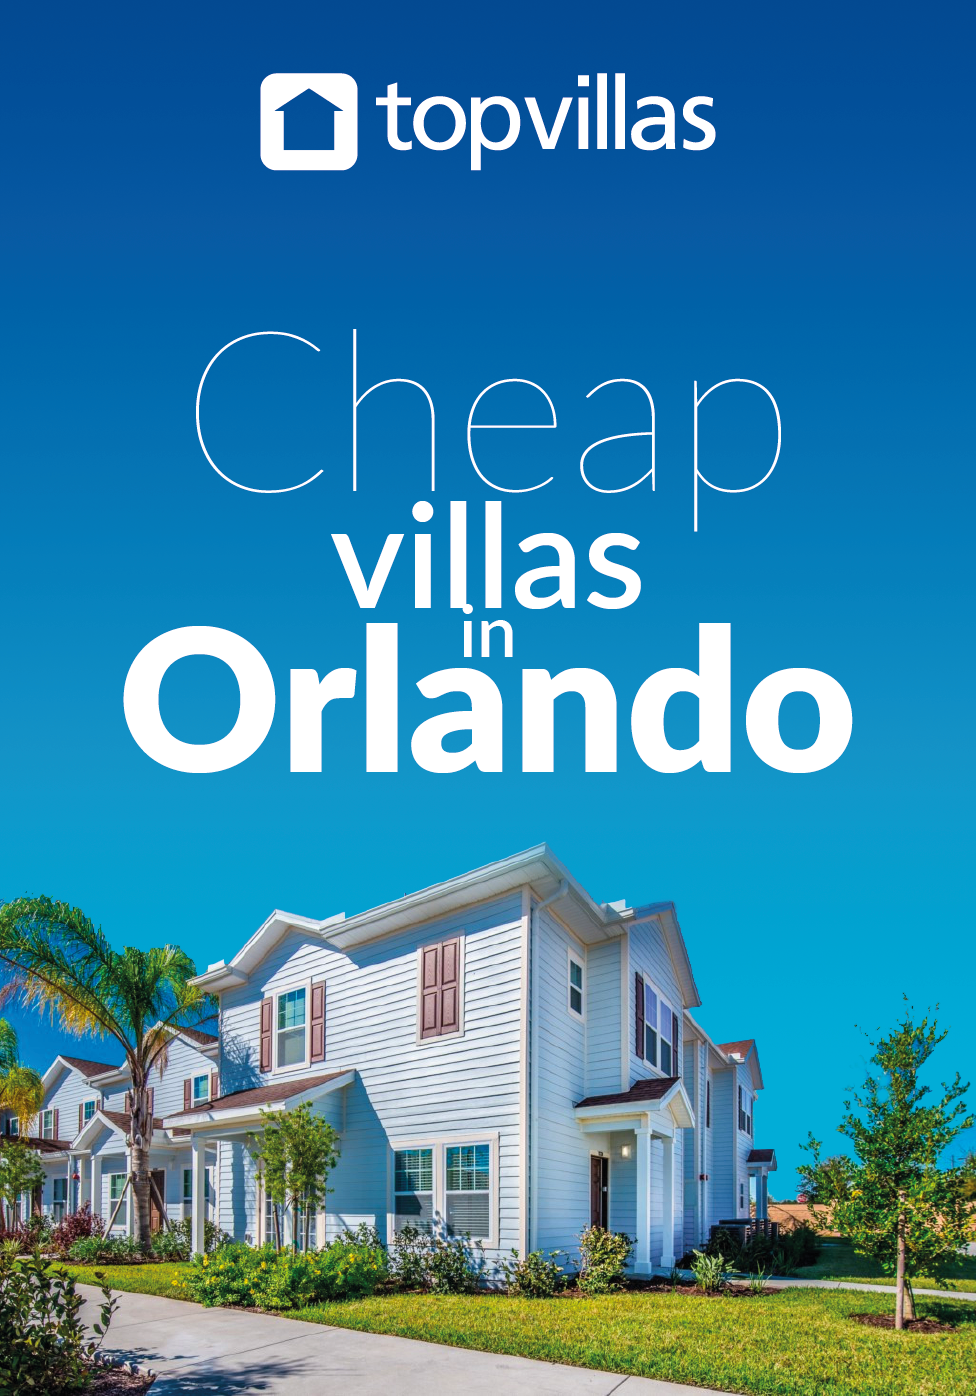 Planning a Florida trip on a budget? Top Villas has a host